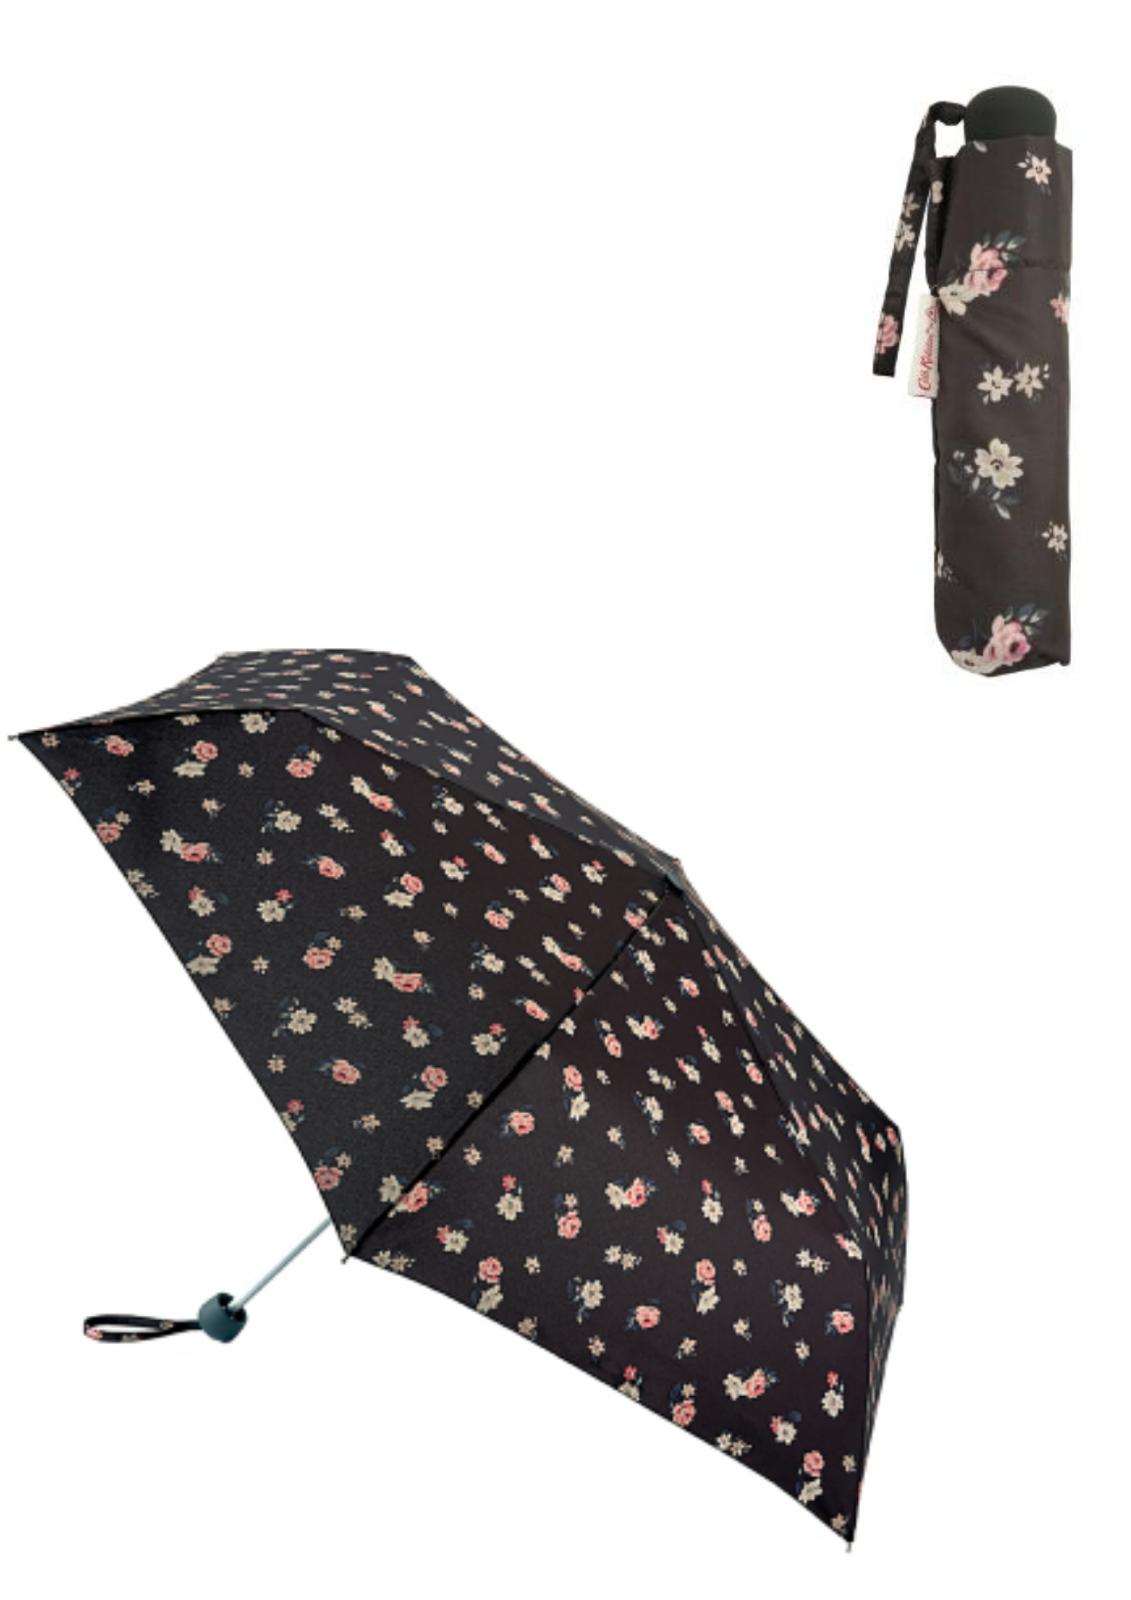 Cath Kidston Minilite Folding Umbrella Hampstead Ditsy Charcoal Colour